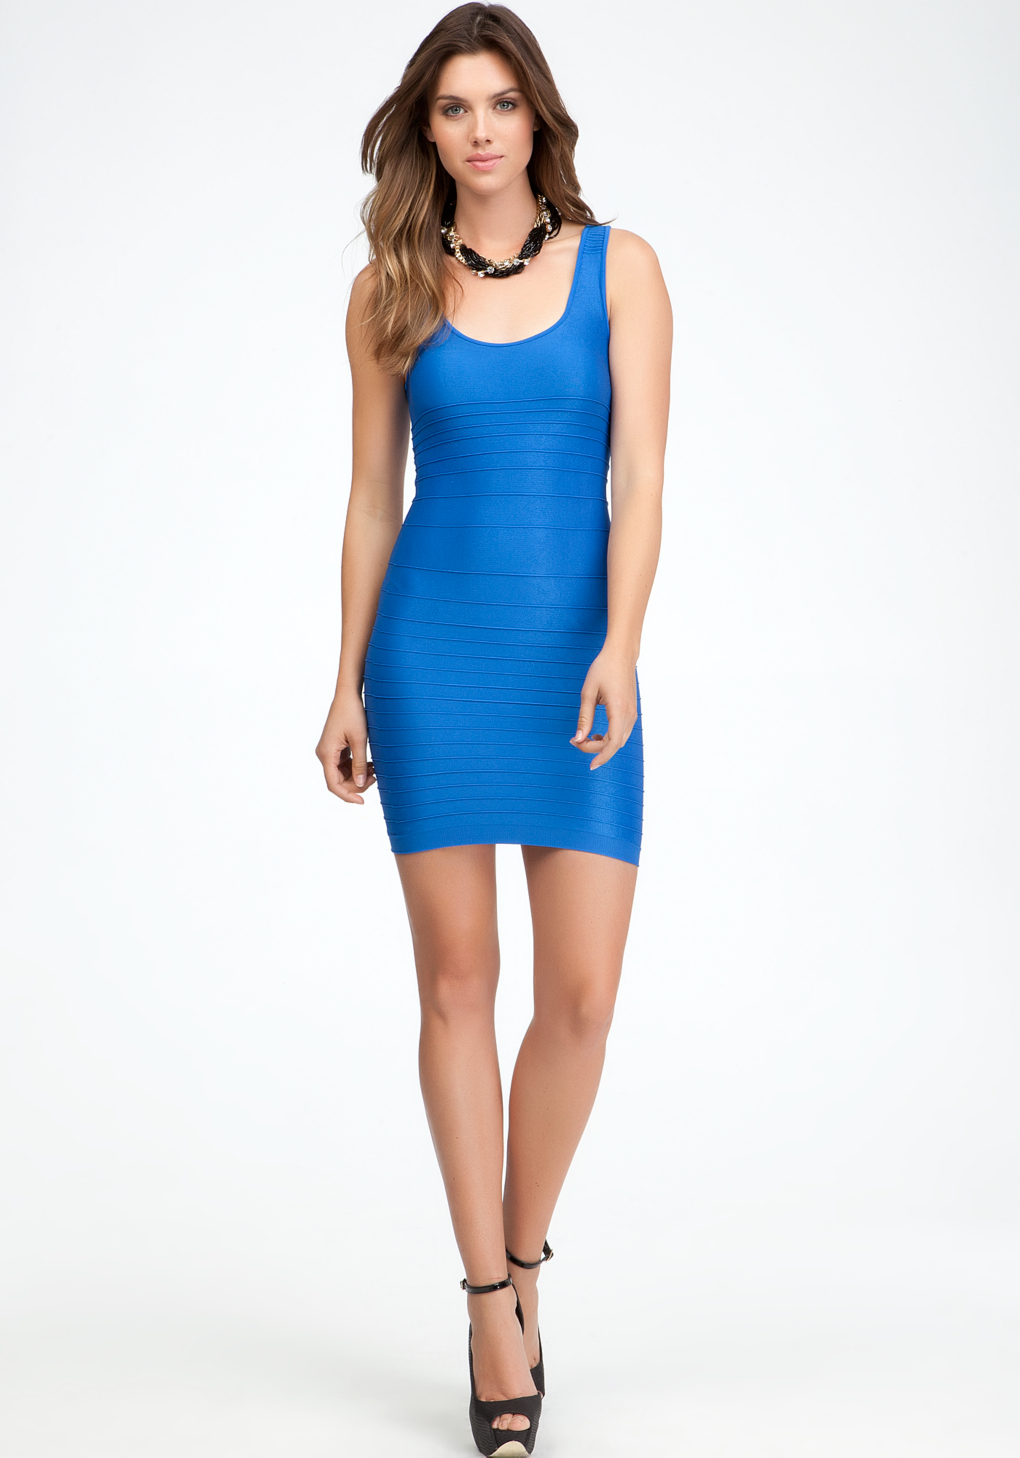 Bebe Back Cutout Shine Bodycon Dress In Blue Lyst